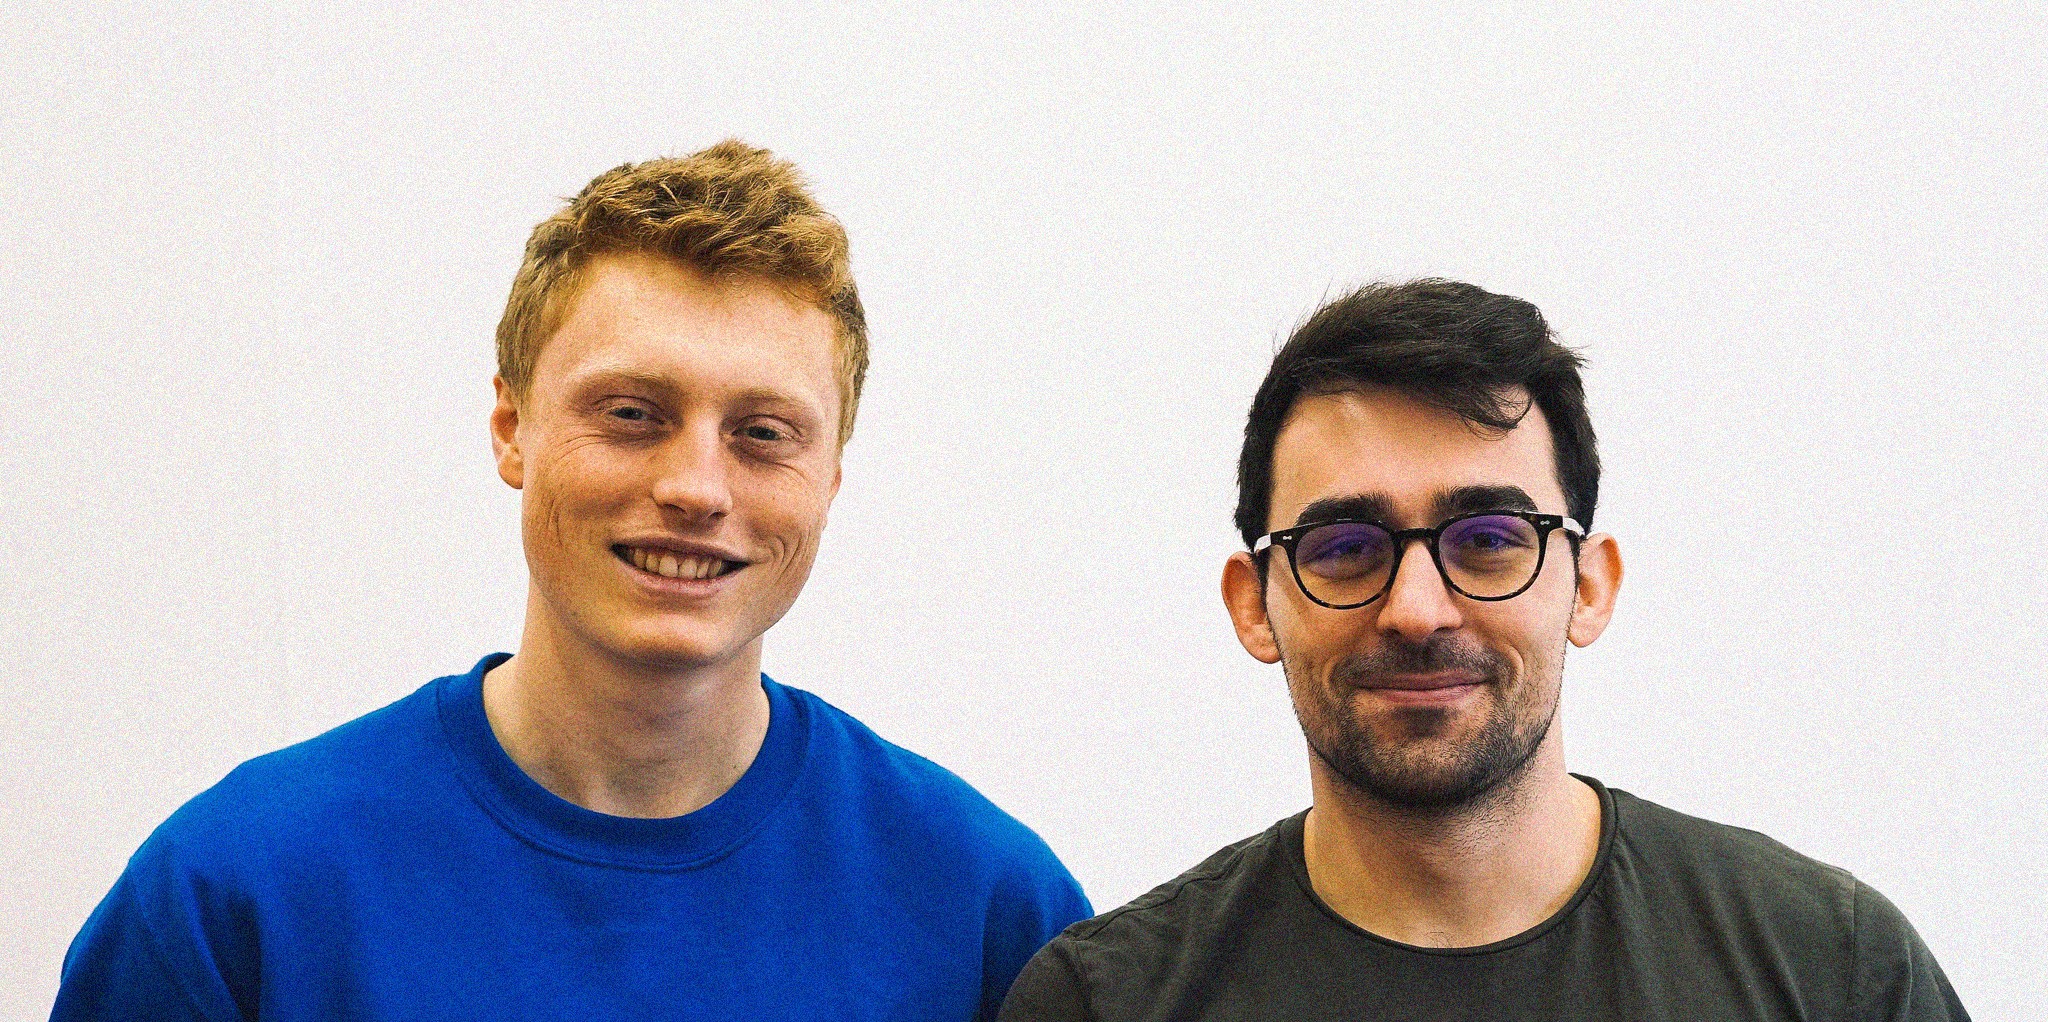 Jacob Wedderburn-Day (Left), Anthony Collias (Right)